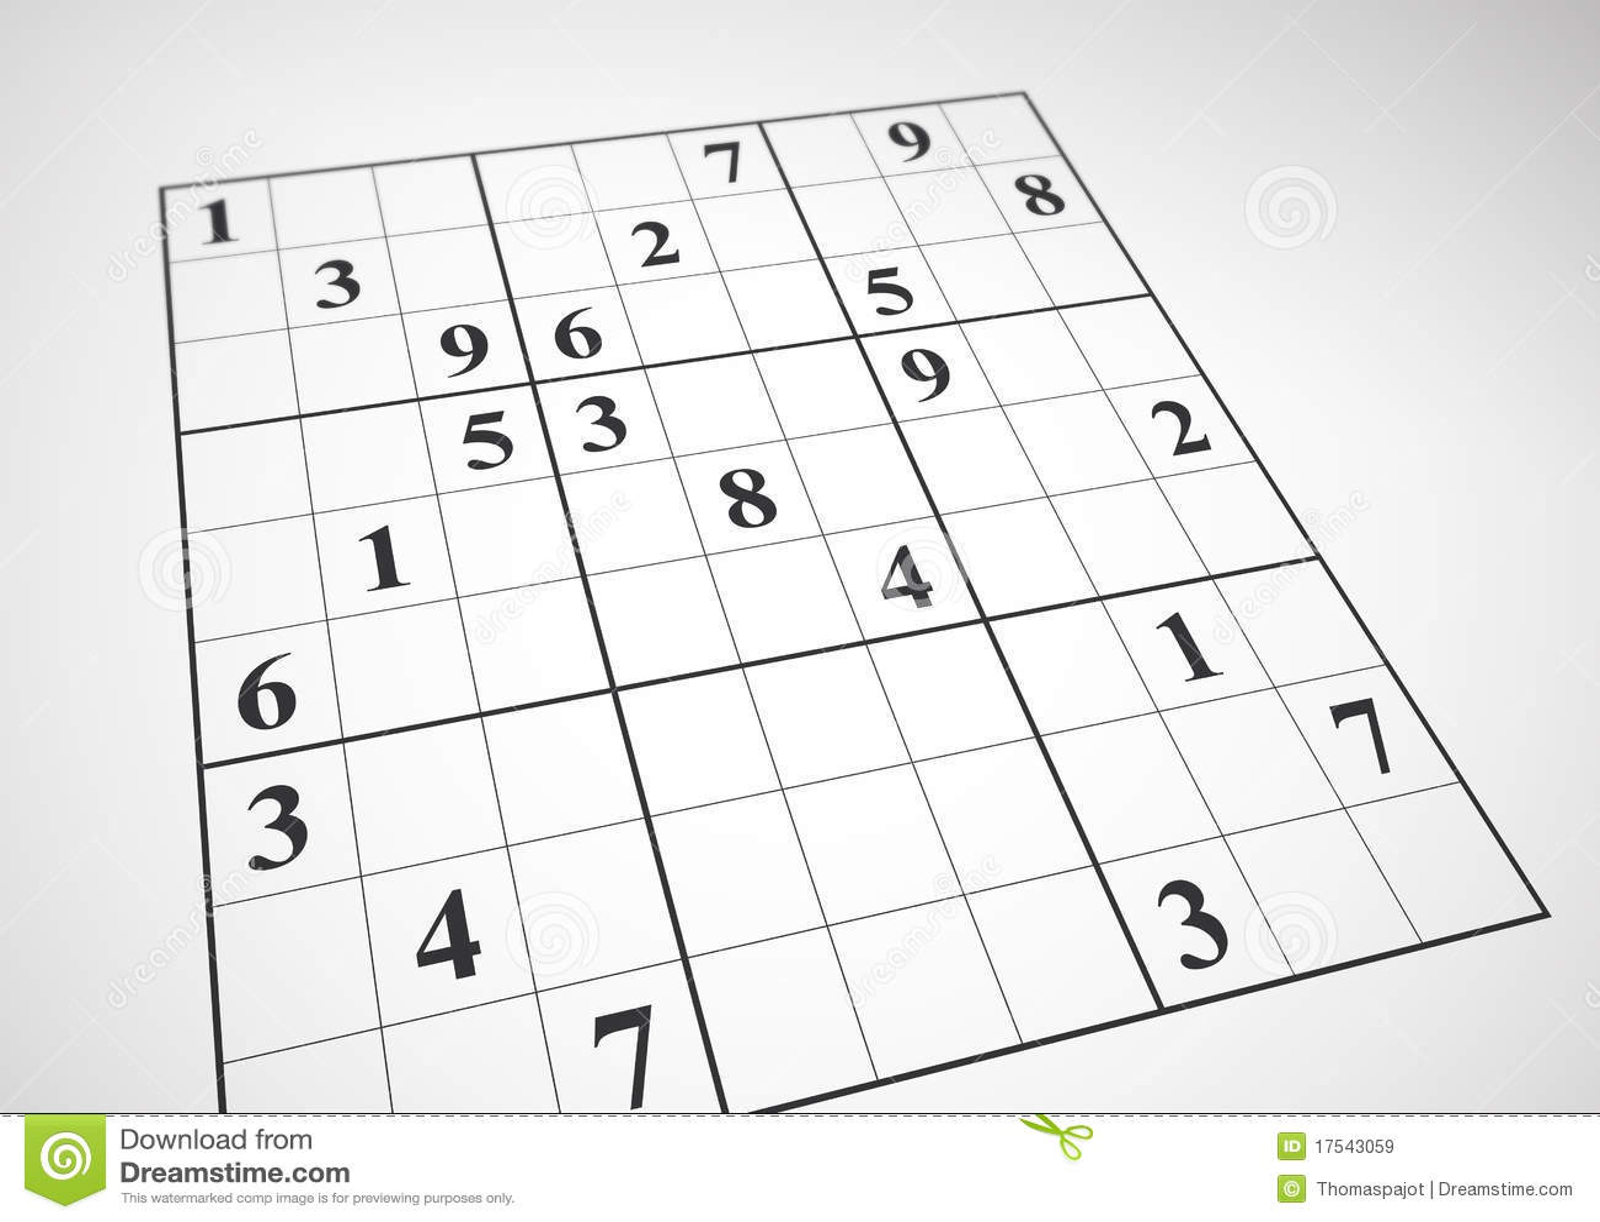 Sudoku stock illustration  Illustration of logic